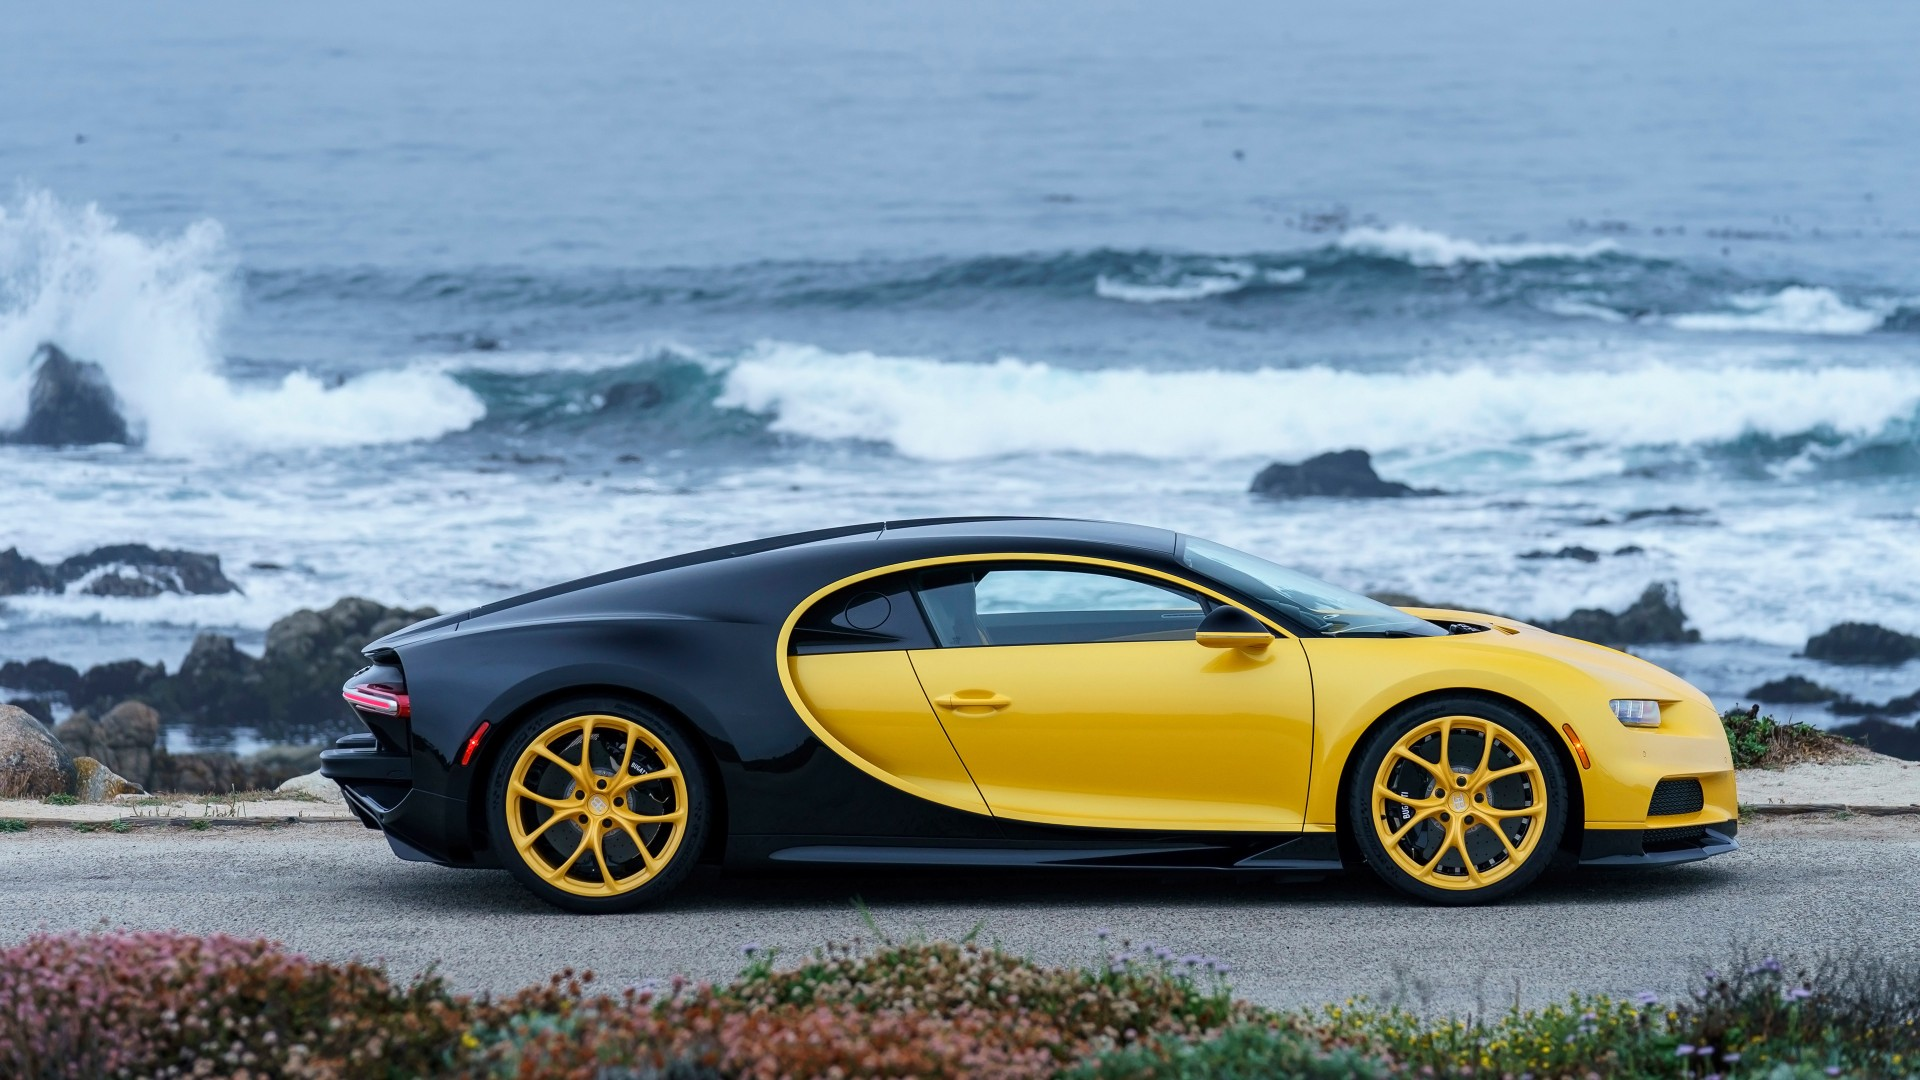 2018 Bugatti Chiron Yellow And Black 4k 3 Wallpaper Hd Car Wallpapers Id 8850